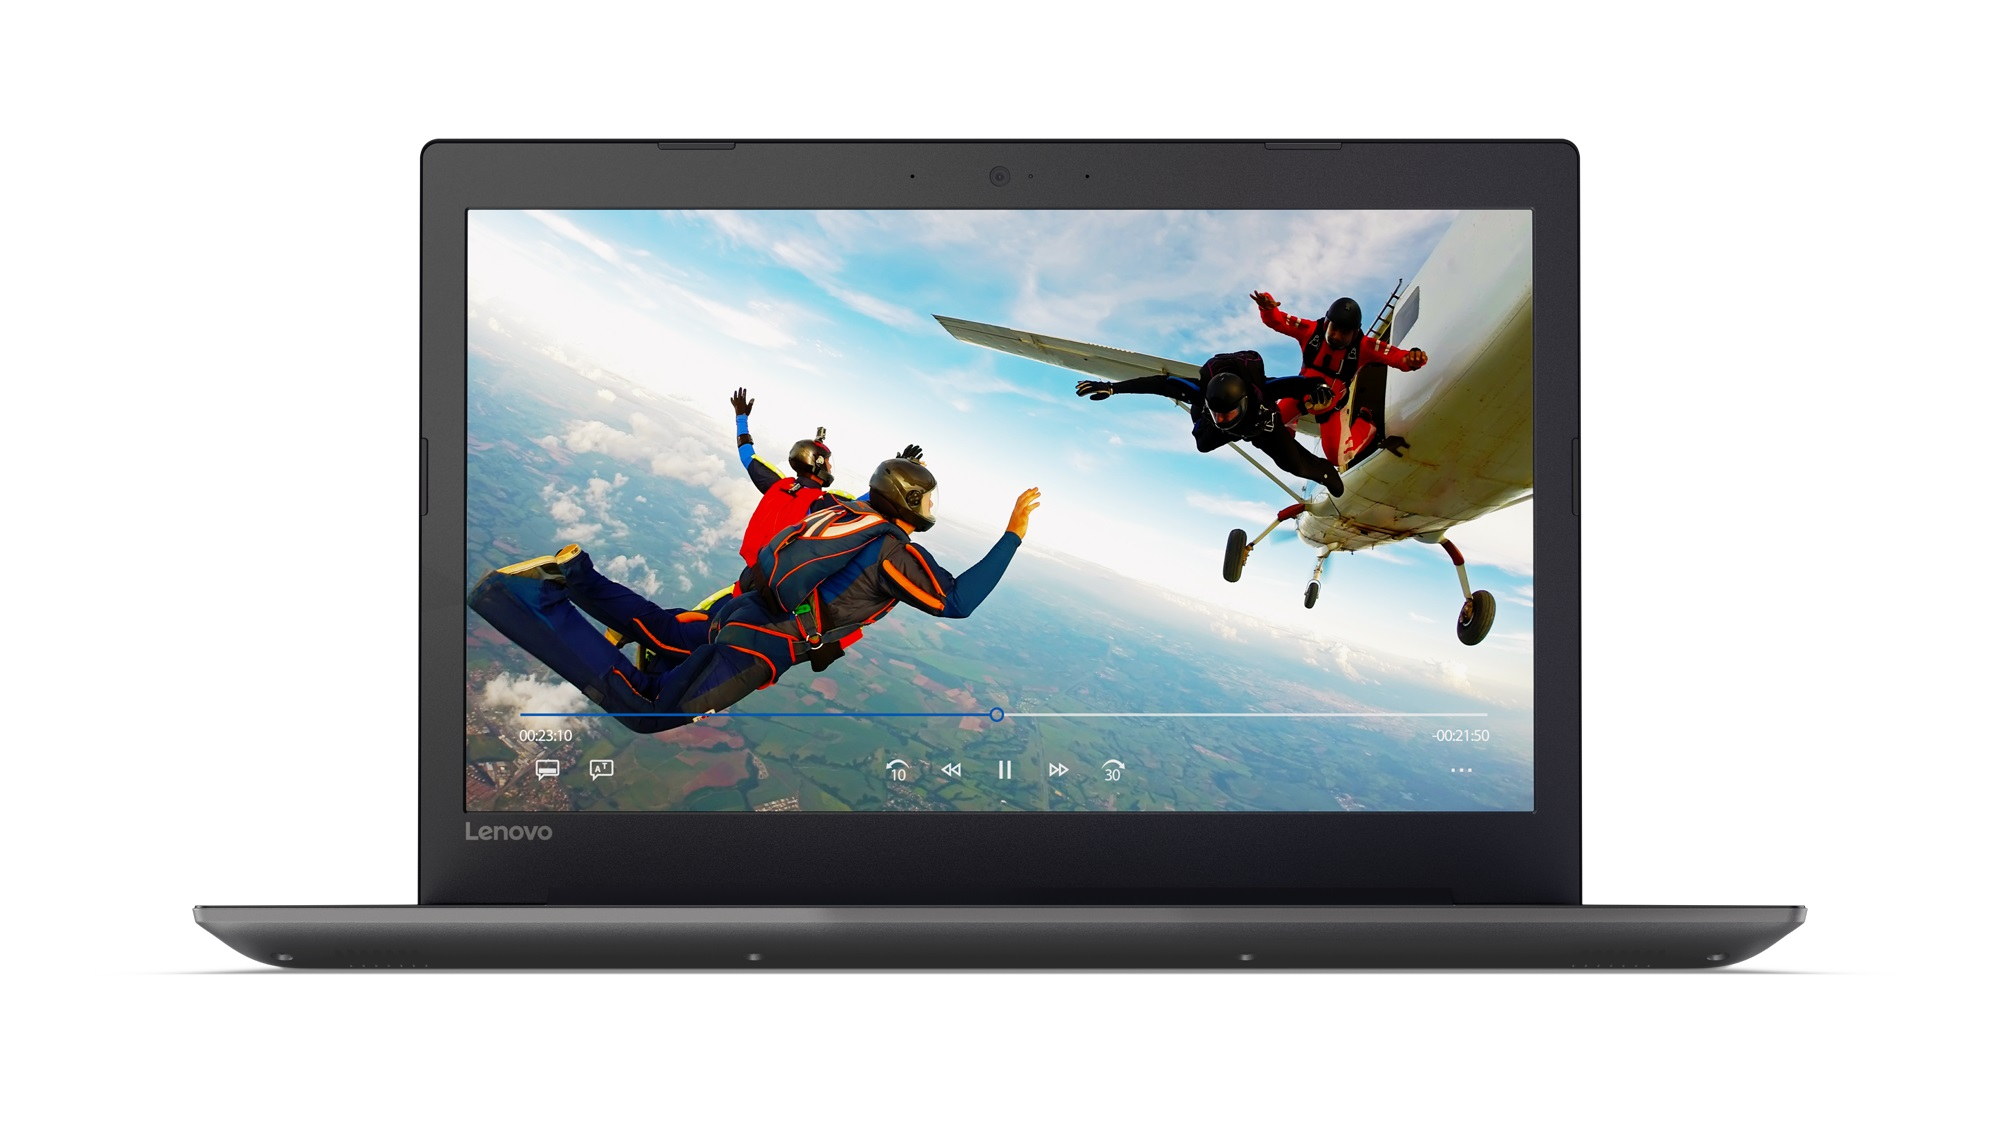 Фото  Ноутбук Lenovo ideapad 320-15IKB Onyx Black (81BG00VBRA)